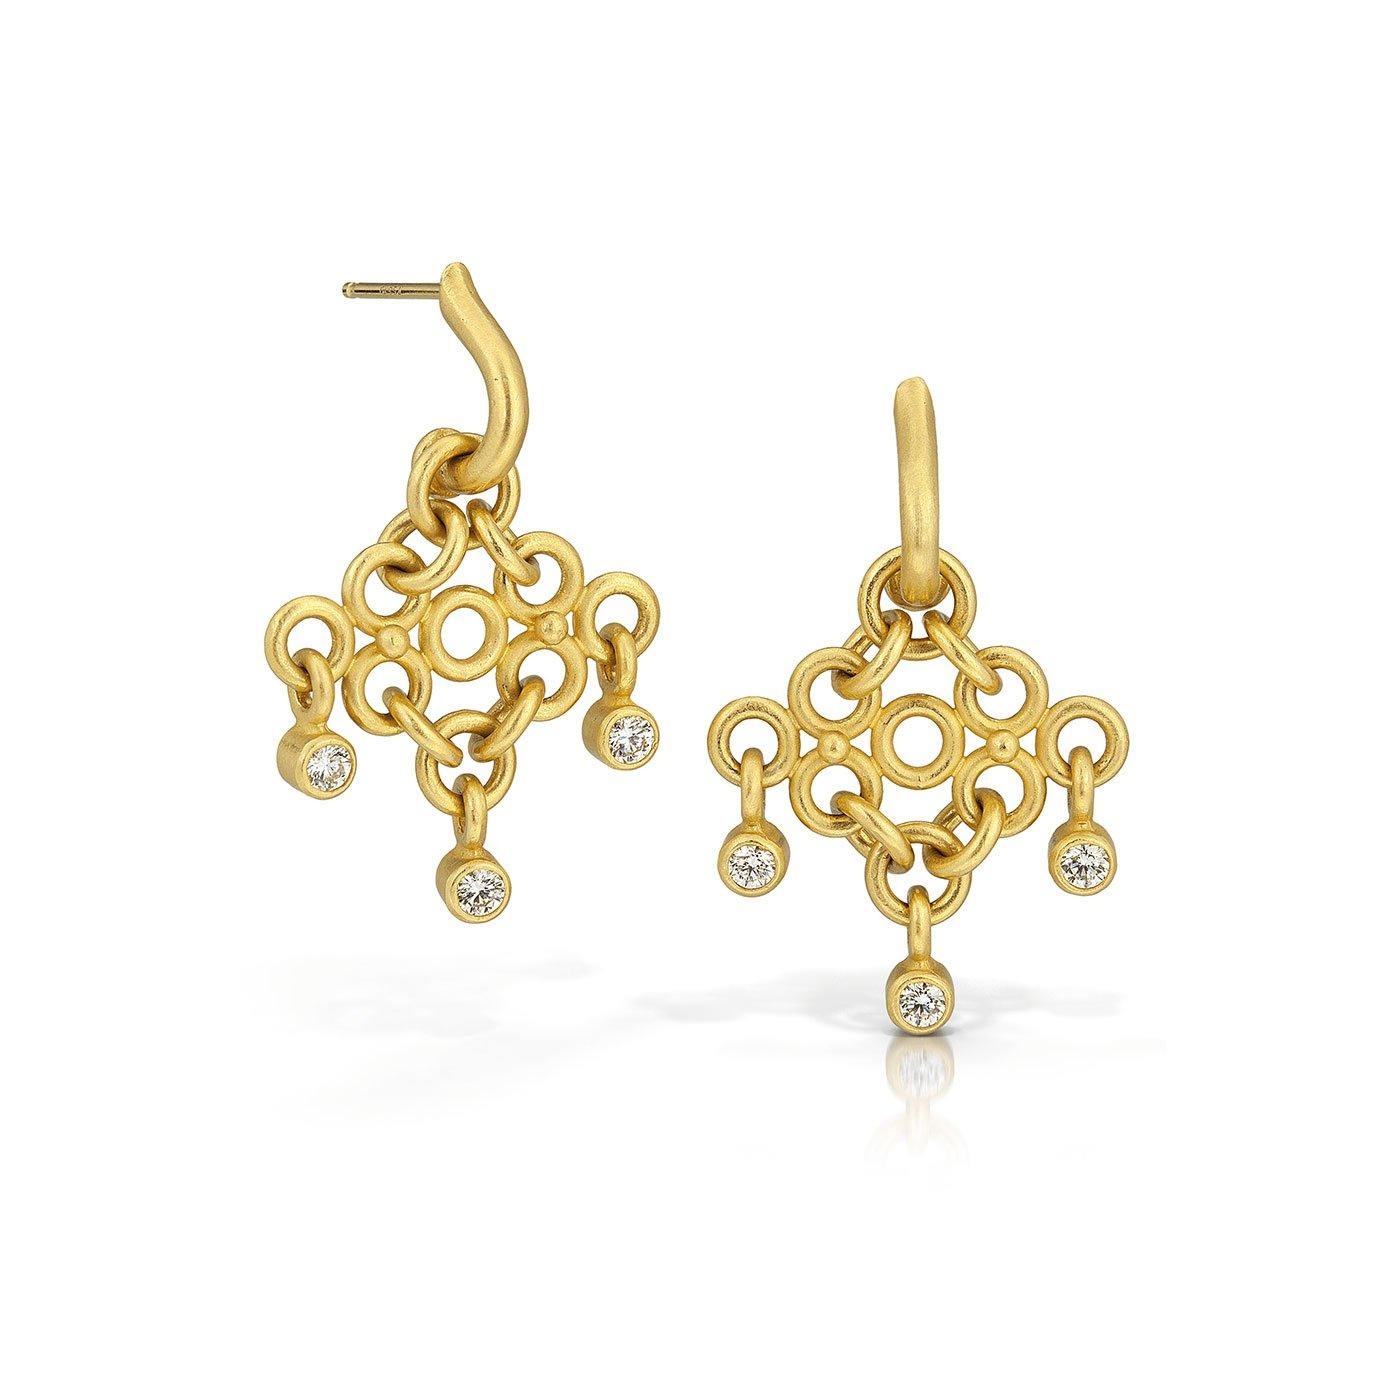 Chandelier Earrings - Betesh - Mansoor Jewelers